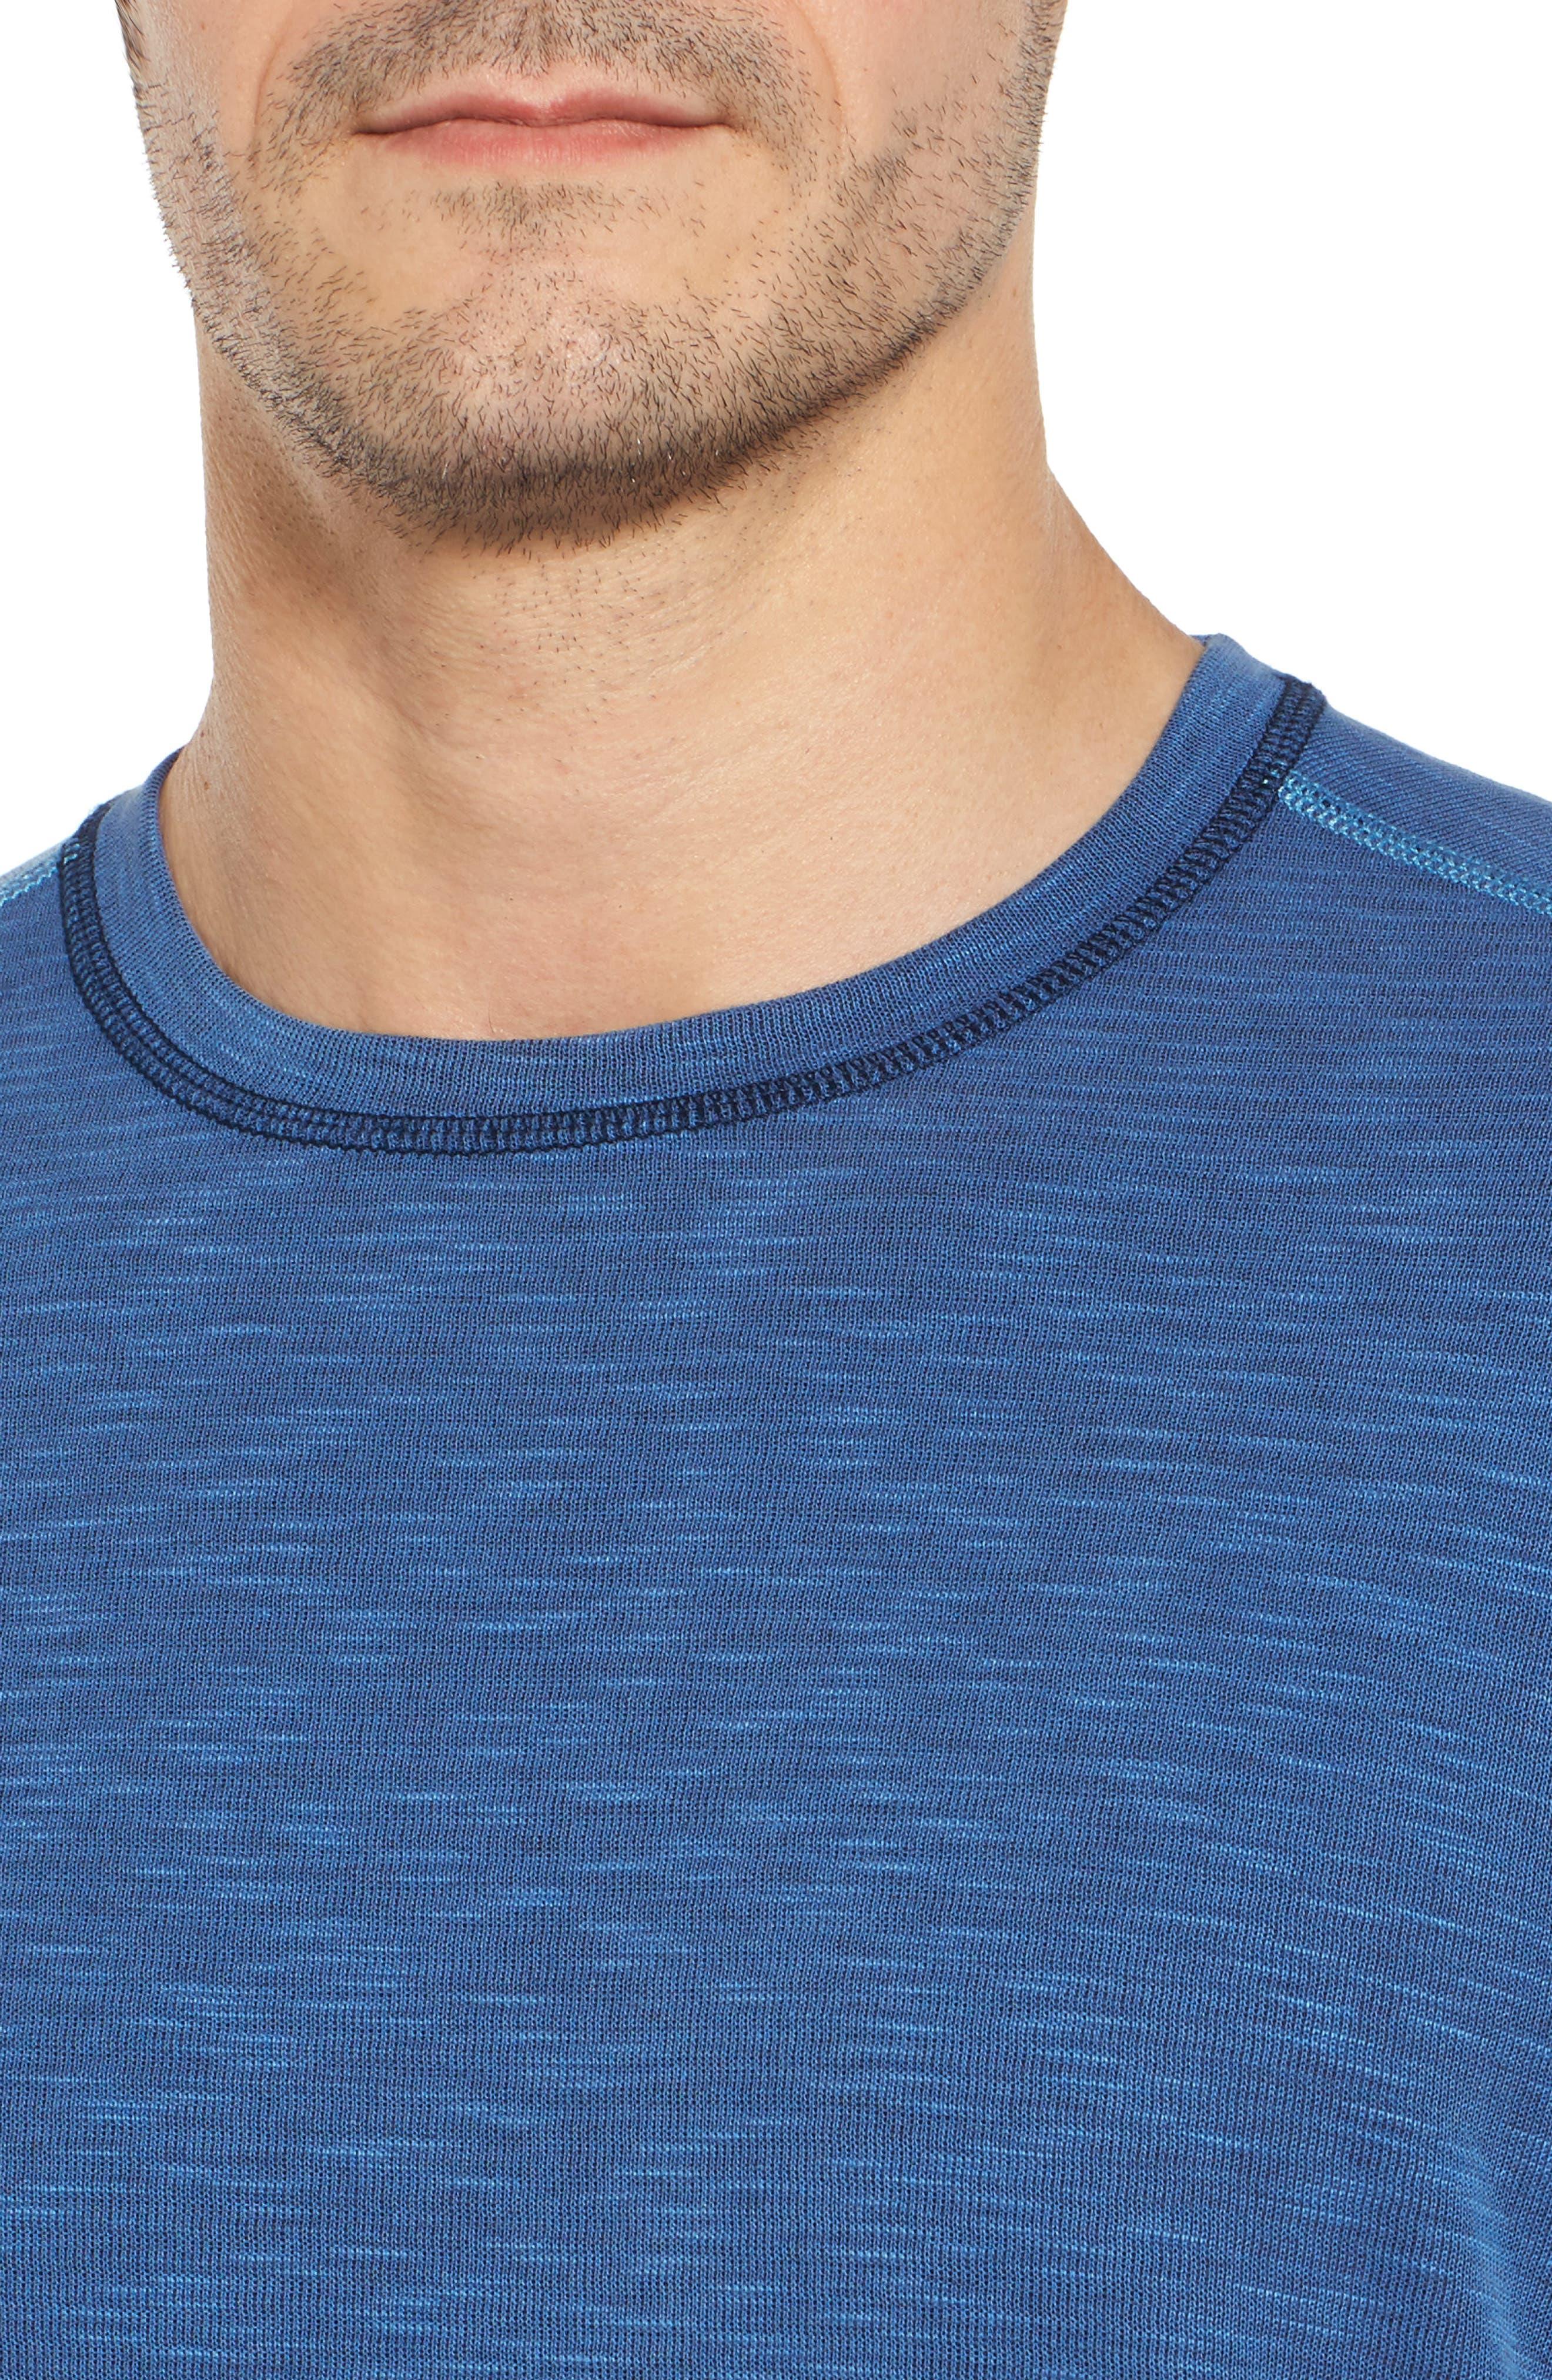 Flip Tide T-Shirt,                             Alternate thumbnail 5, color,                             Galaxy Blue